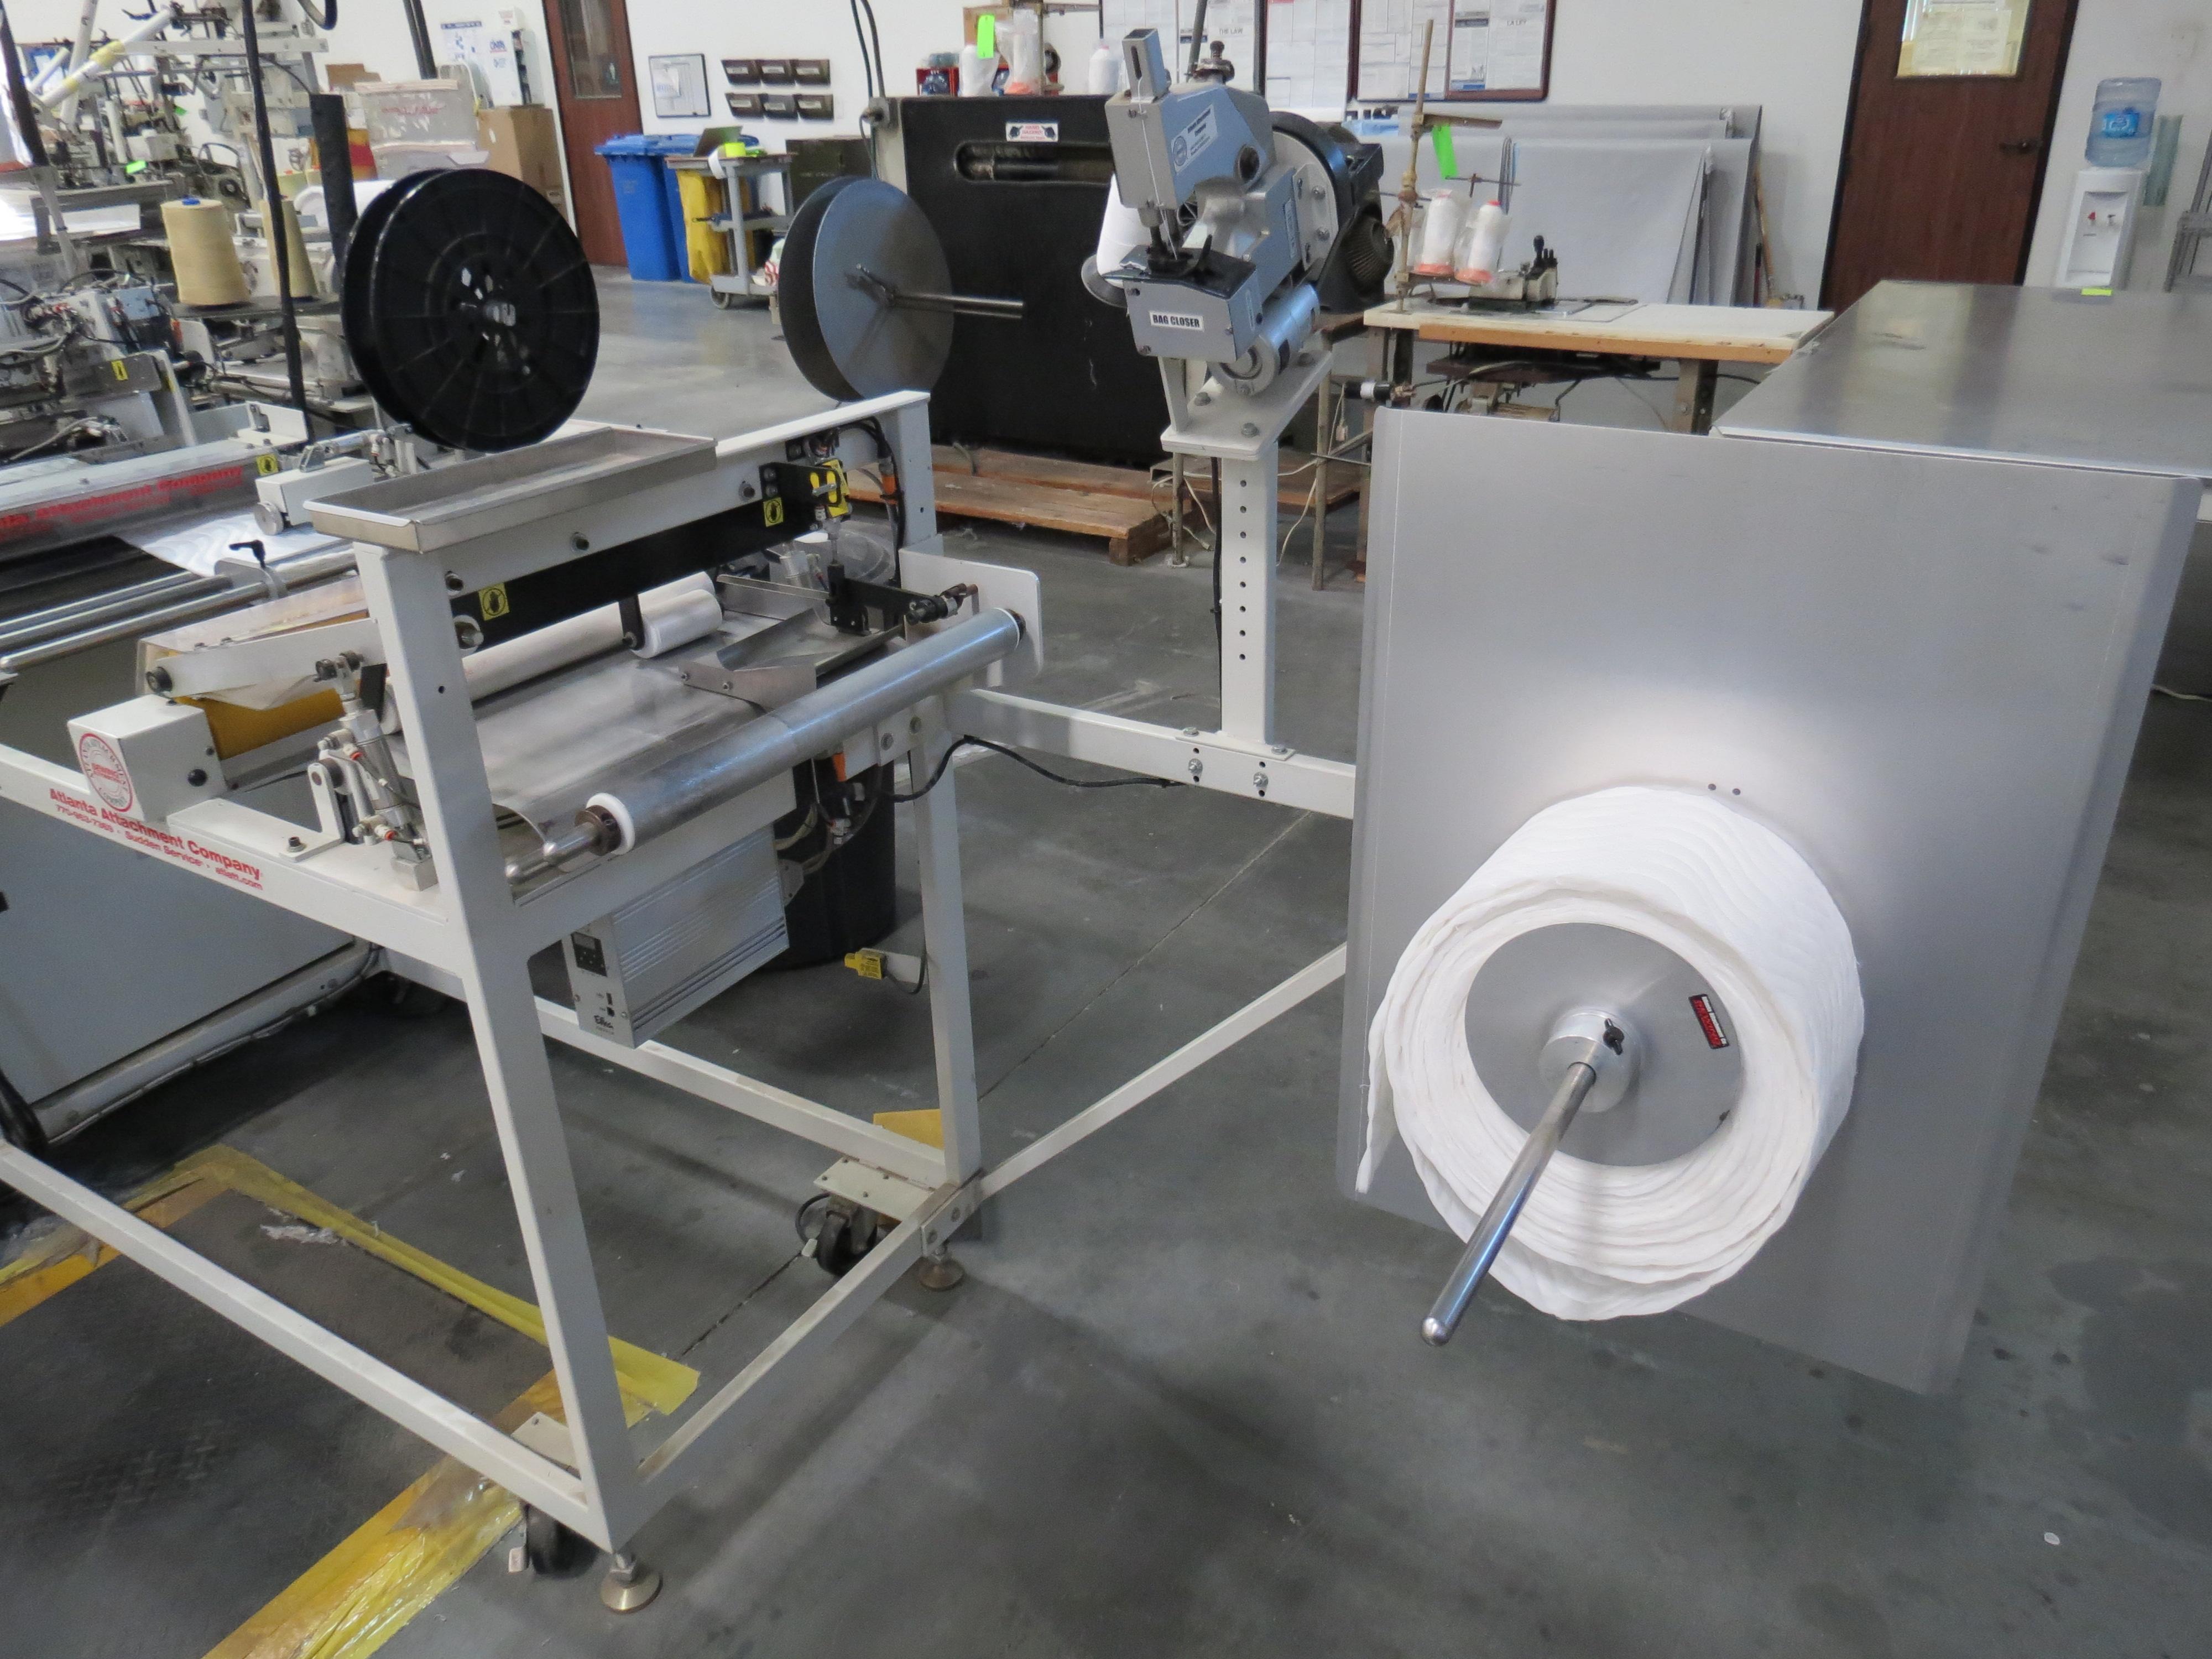 Atlanta Attachment Company, 4300BBorder/Attach Handles Sewing Machine, 220V, SN:209227071609, Juki - Image 10 of 11